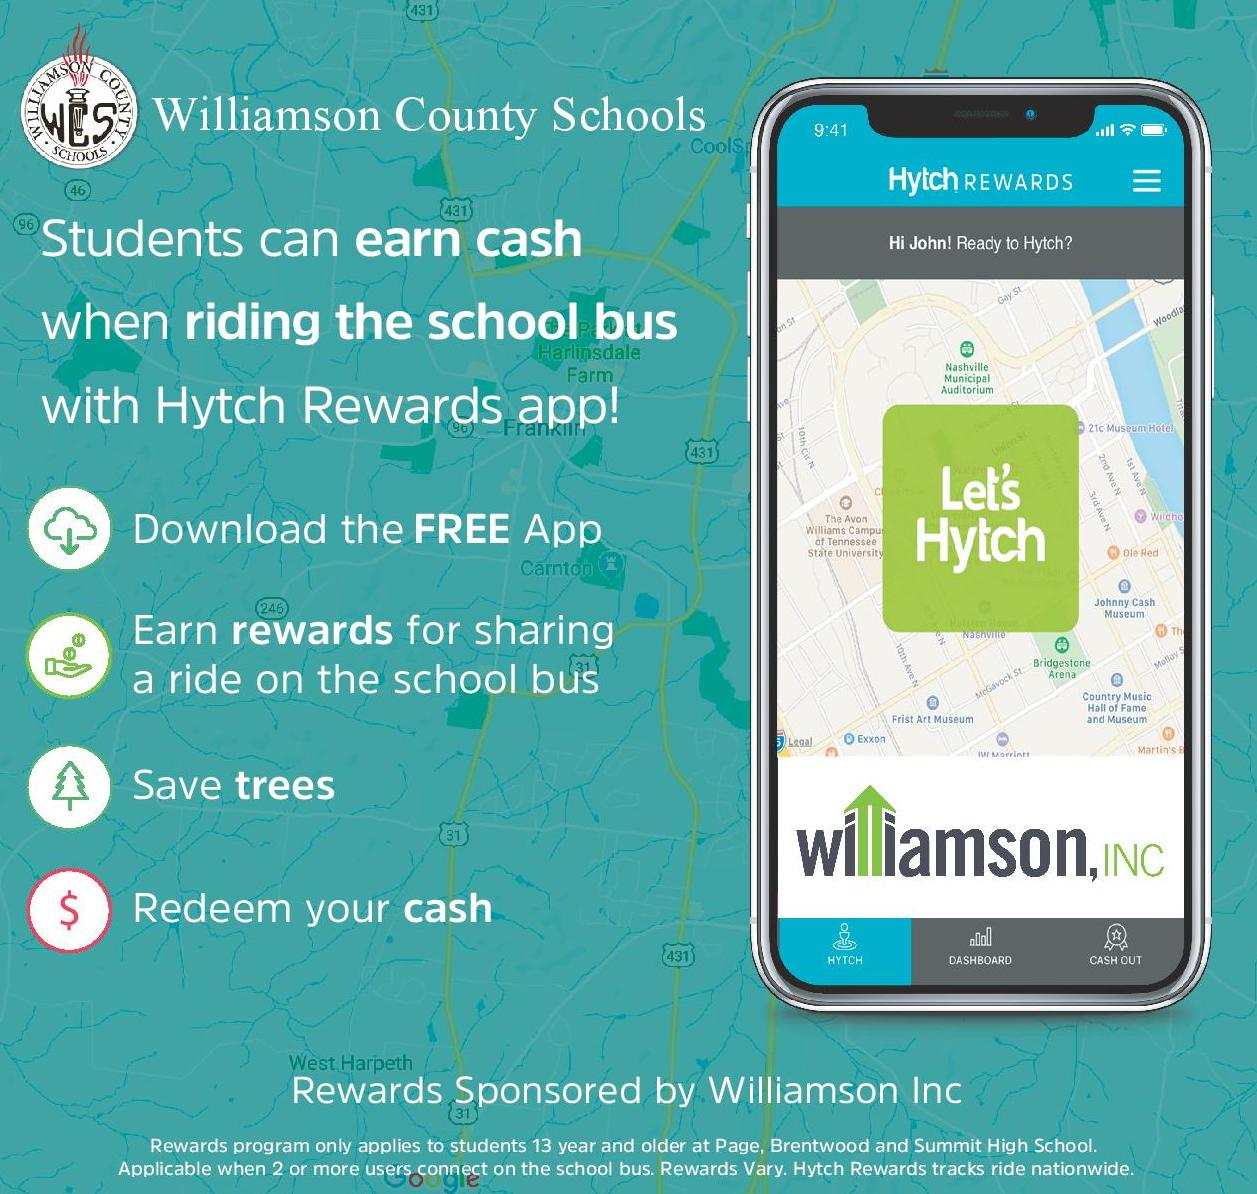 Hytch_8halfx11_OnboardingDocument_EmployerSponsor_WilliamsonCountySchoolsTN_V2 (1)-page-001